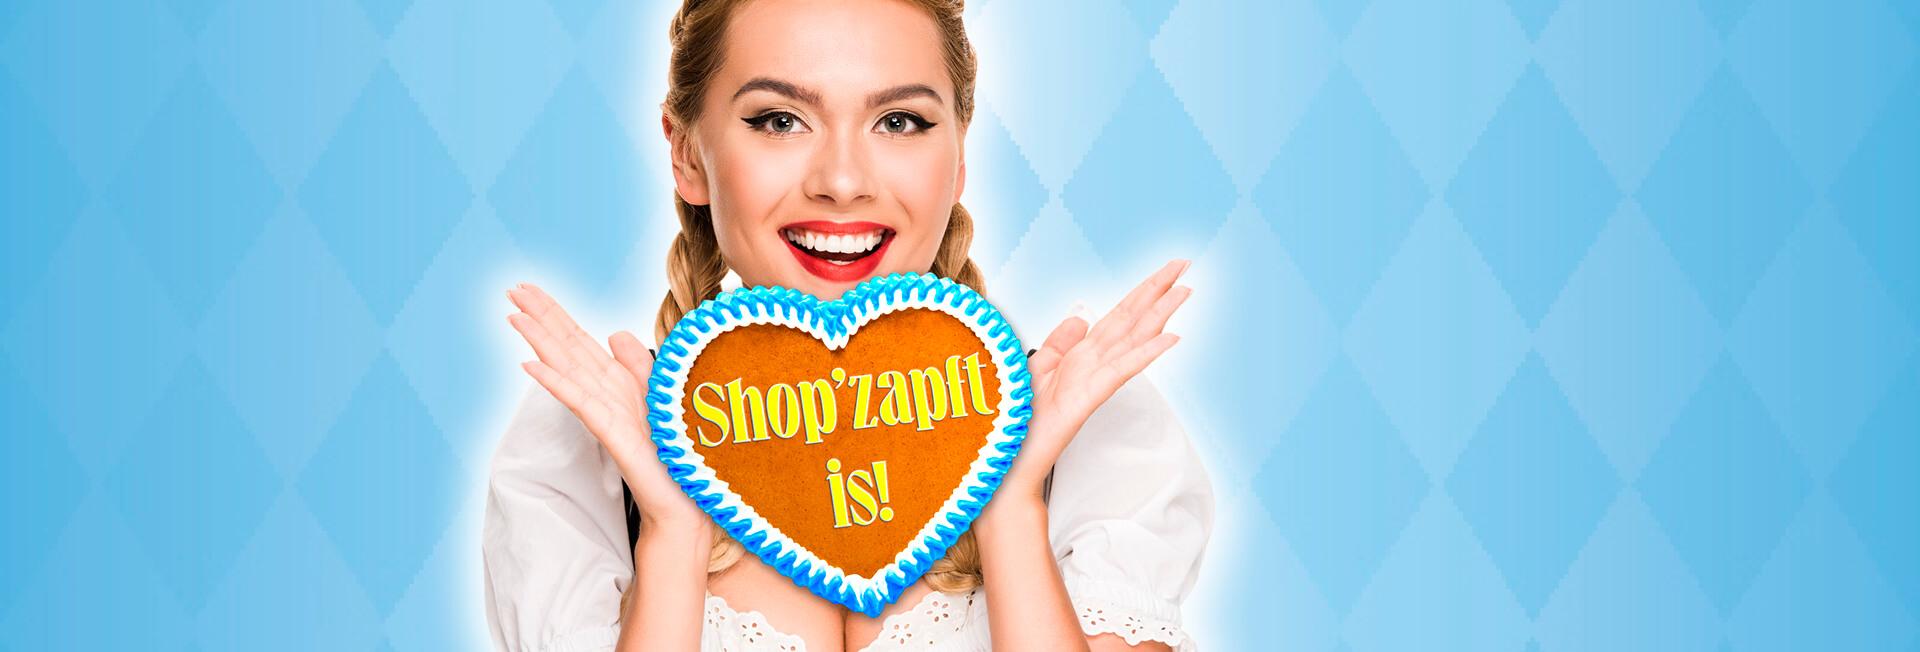 Shoptober Fest im Kaufhaus Tyrol